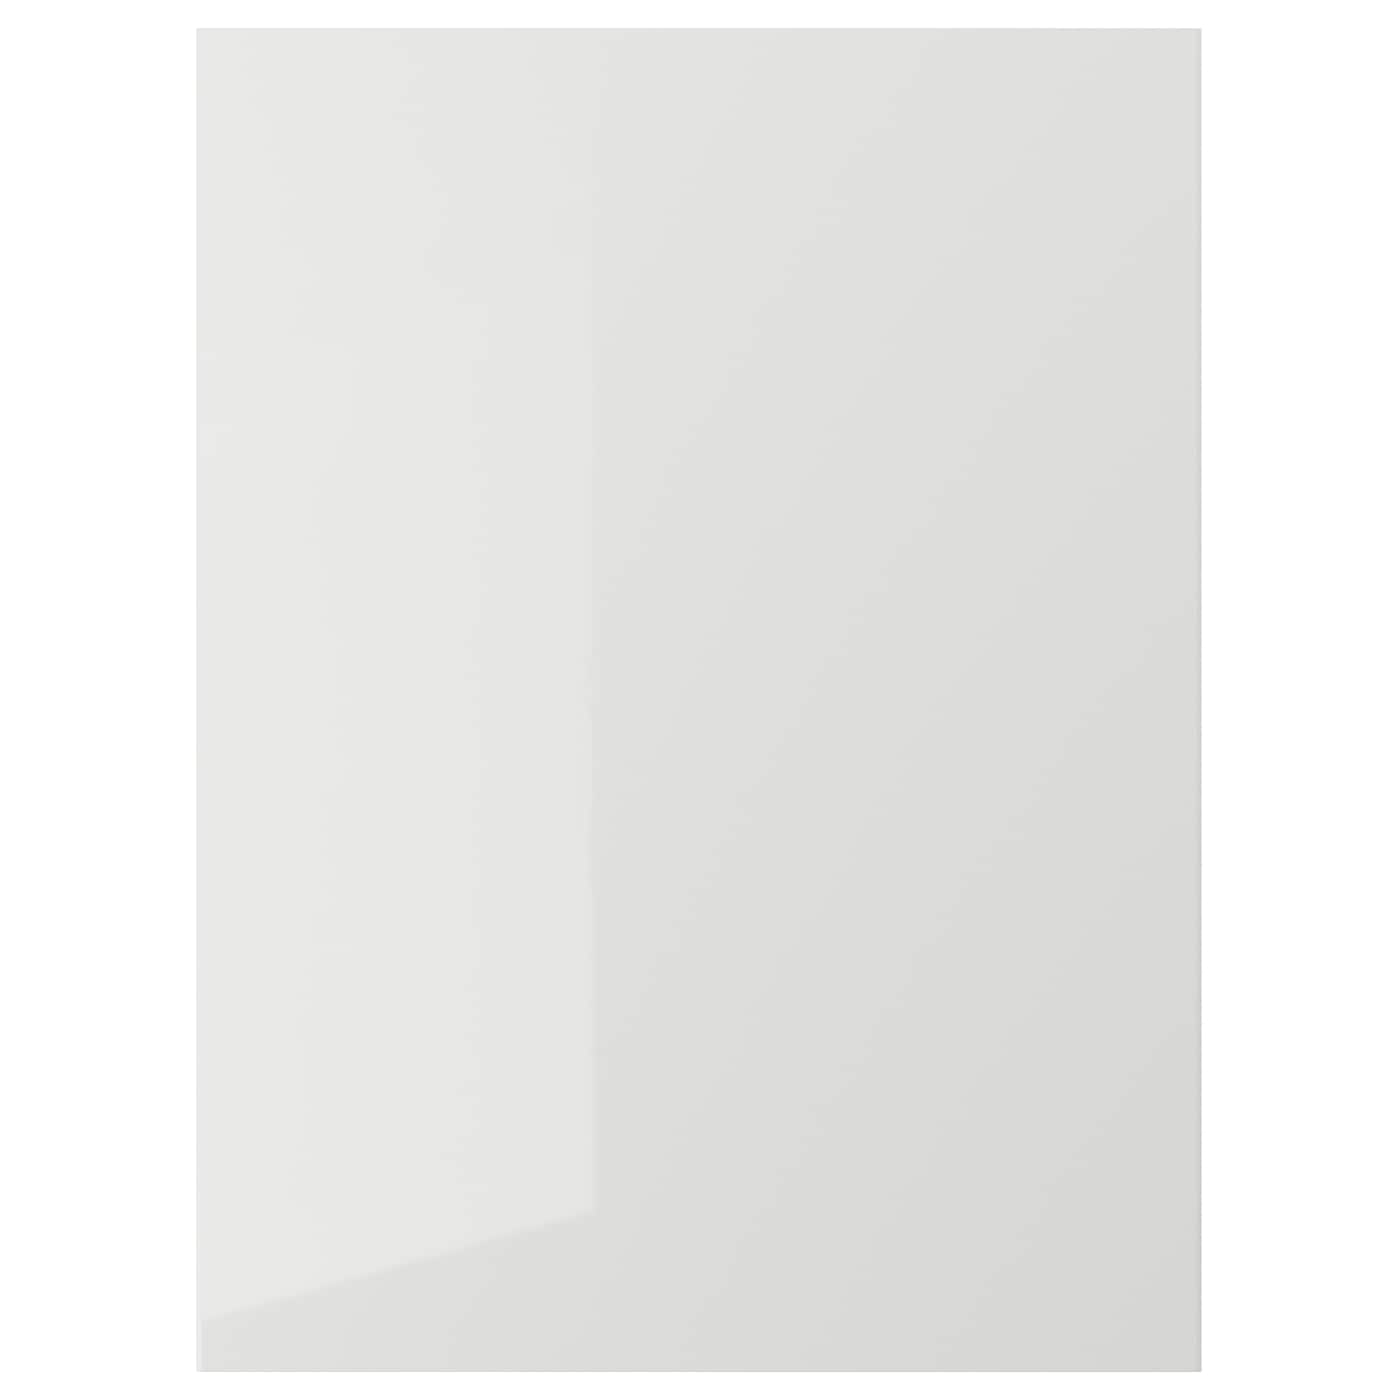 Ringhult Door High Gloss White 60 X 80 Cm: Replacement Kitchen Doors